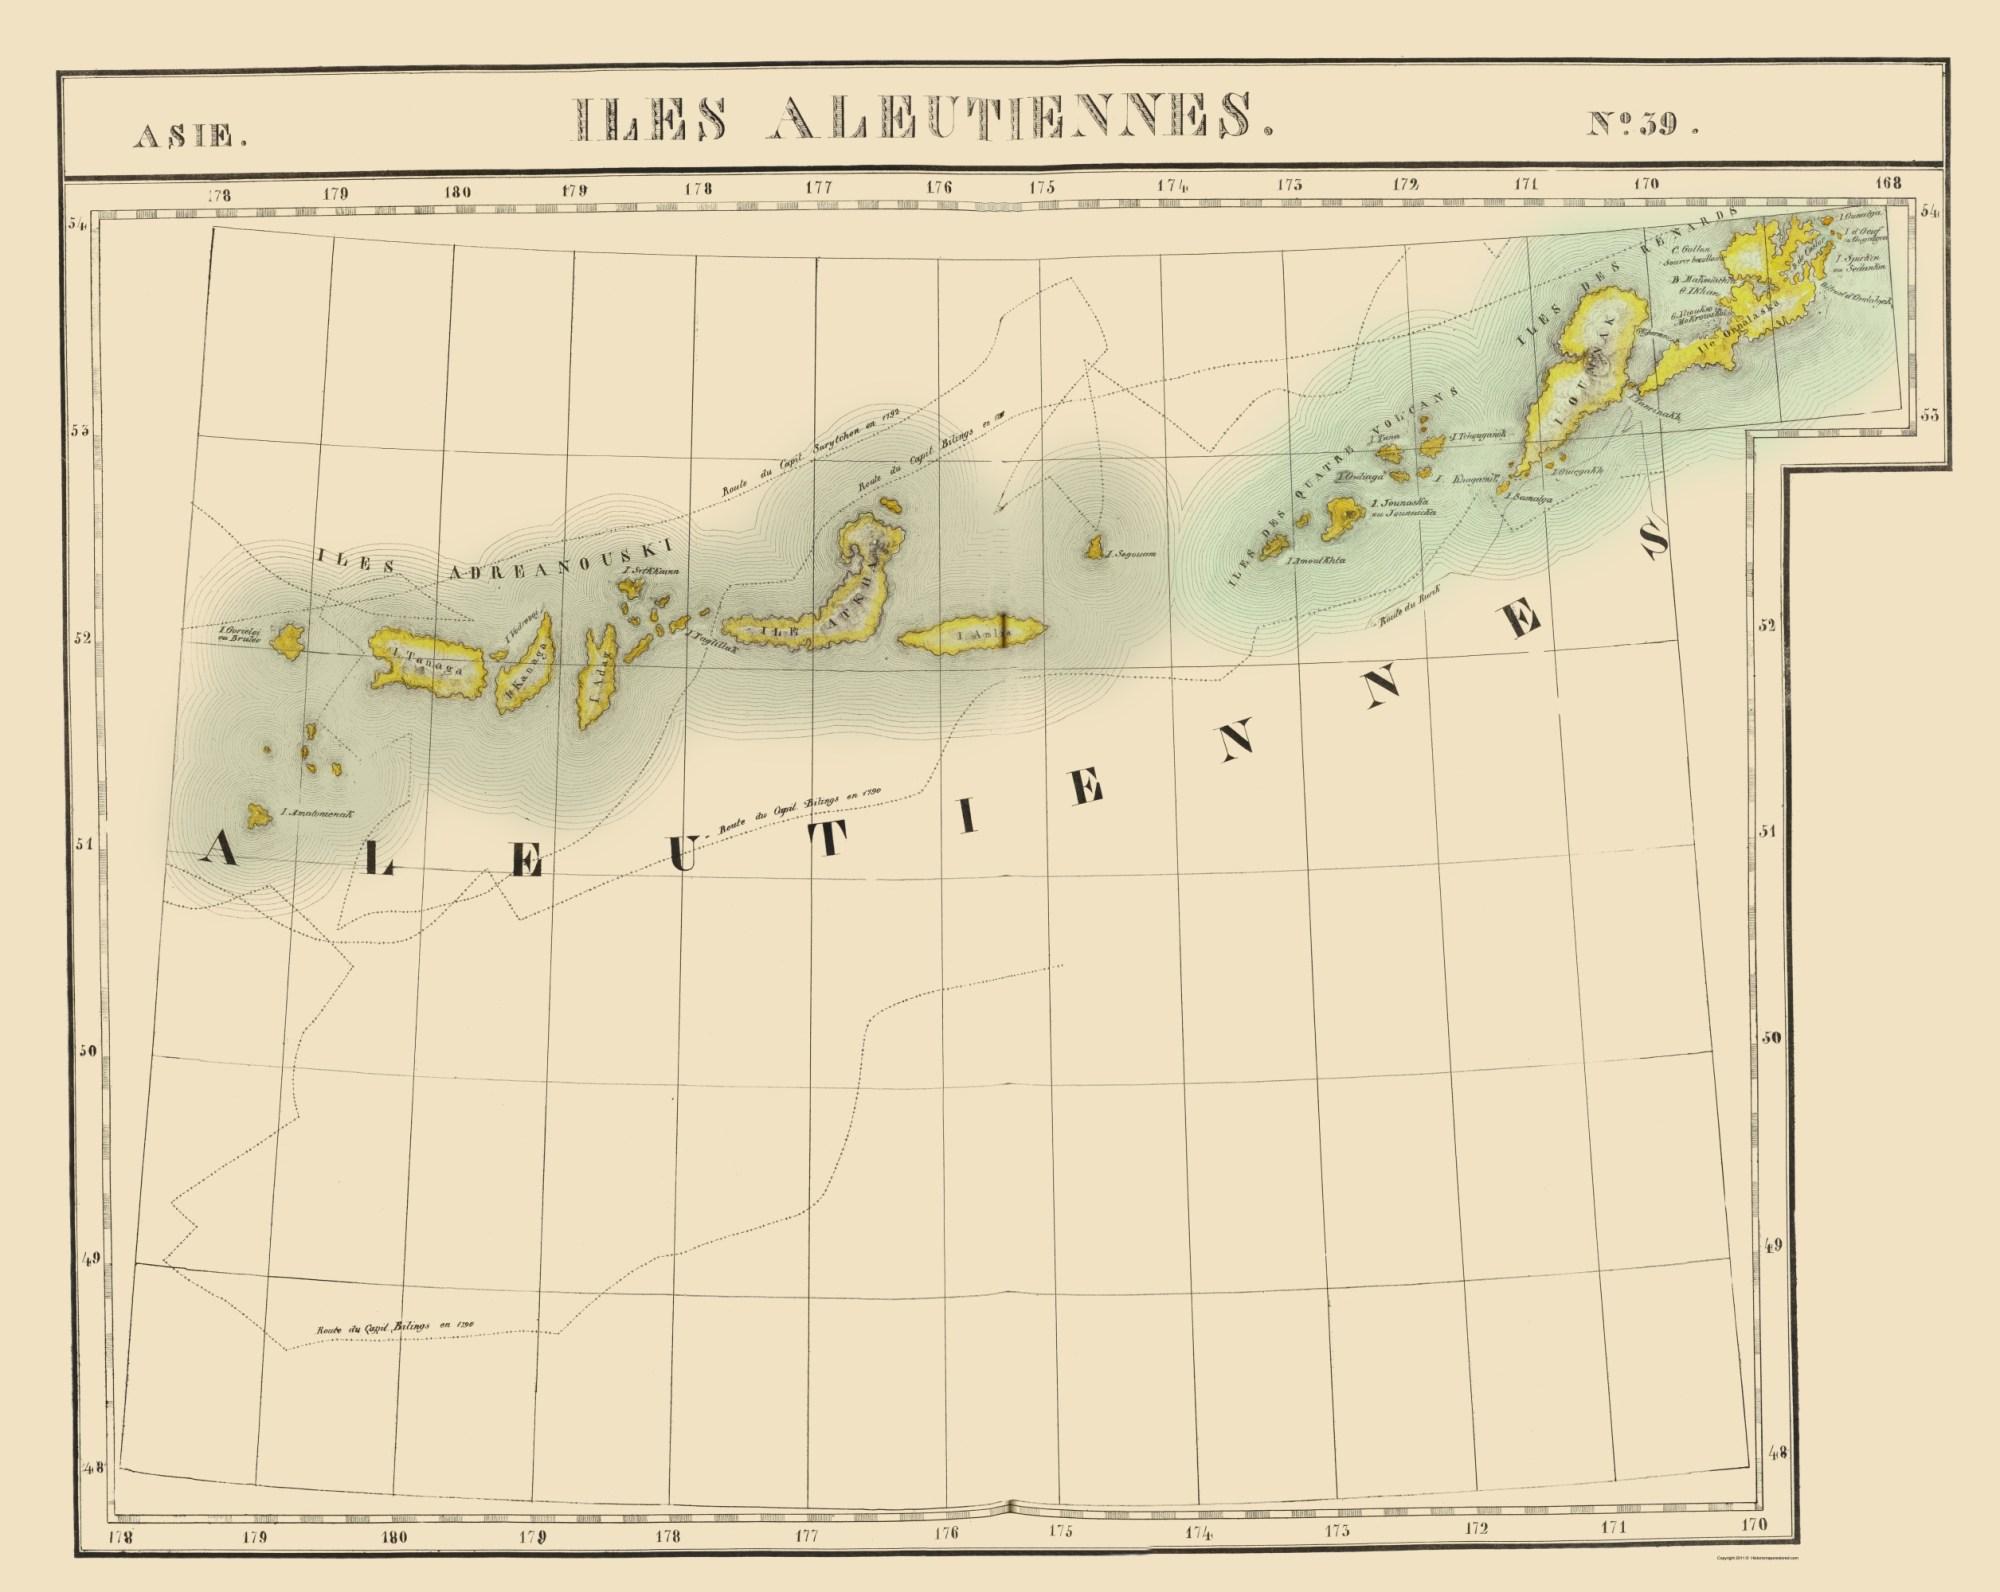 hight resolution of aleutian islands alaska vandermaelen 1827 23 x 28 87